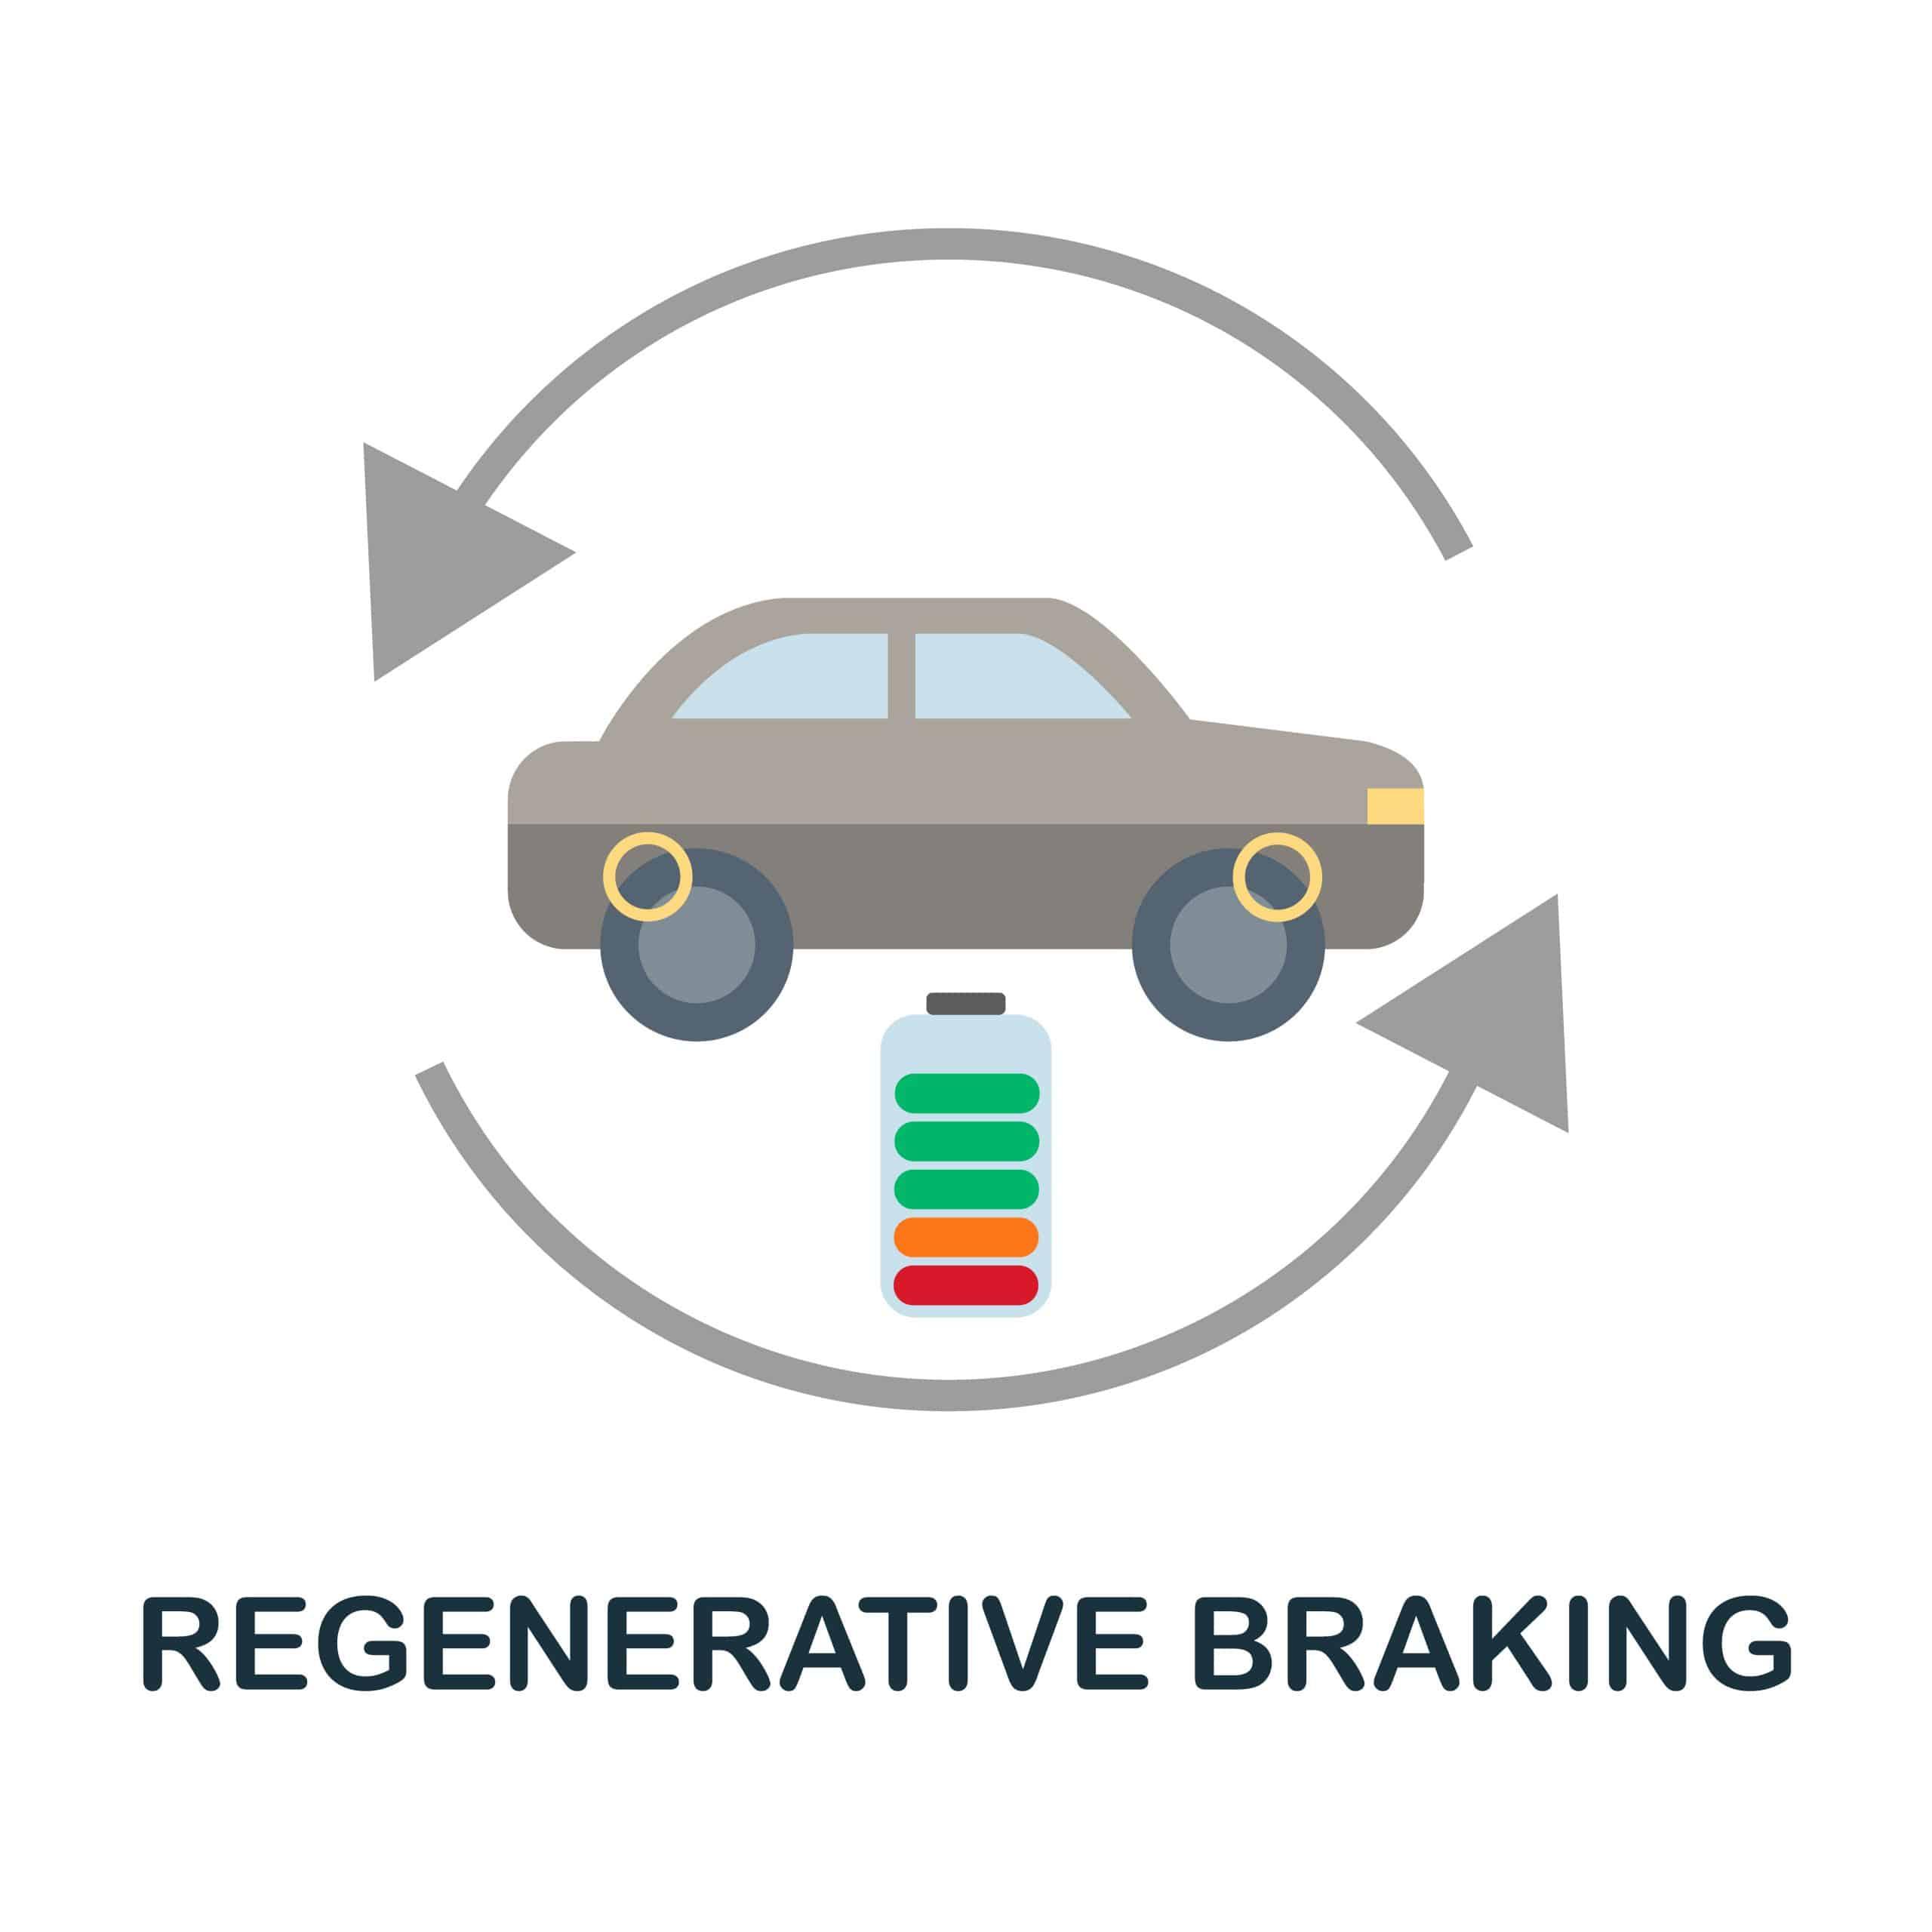 Regenerative braking icon diagram